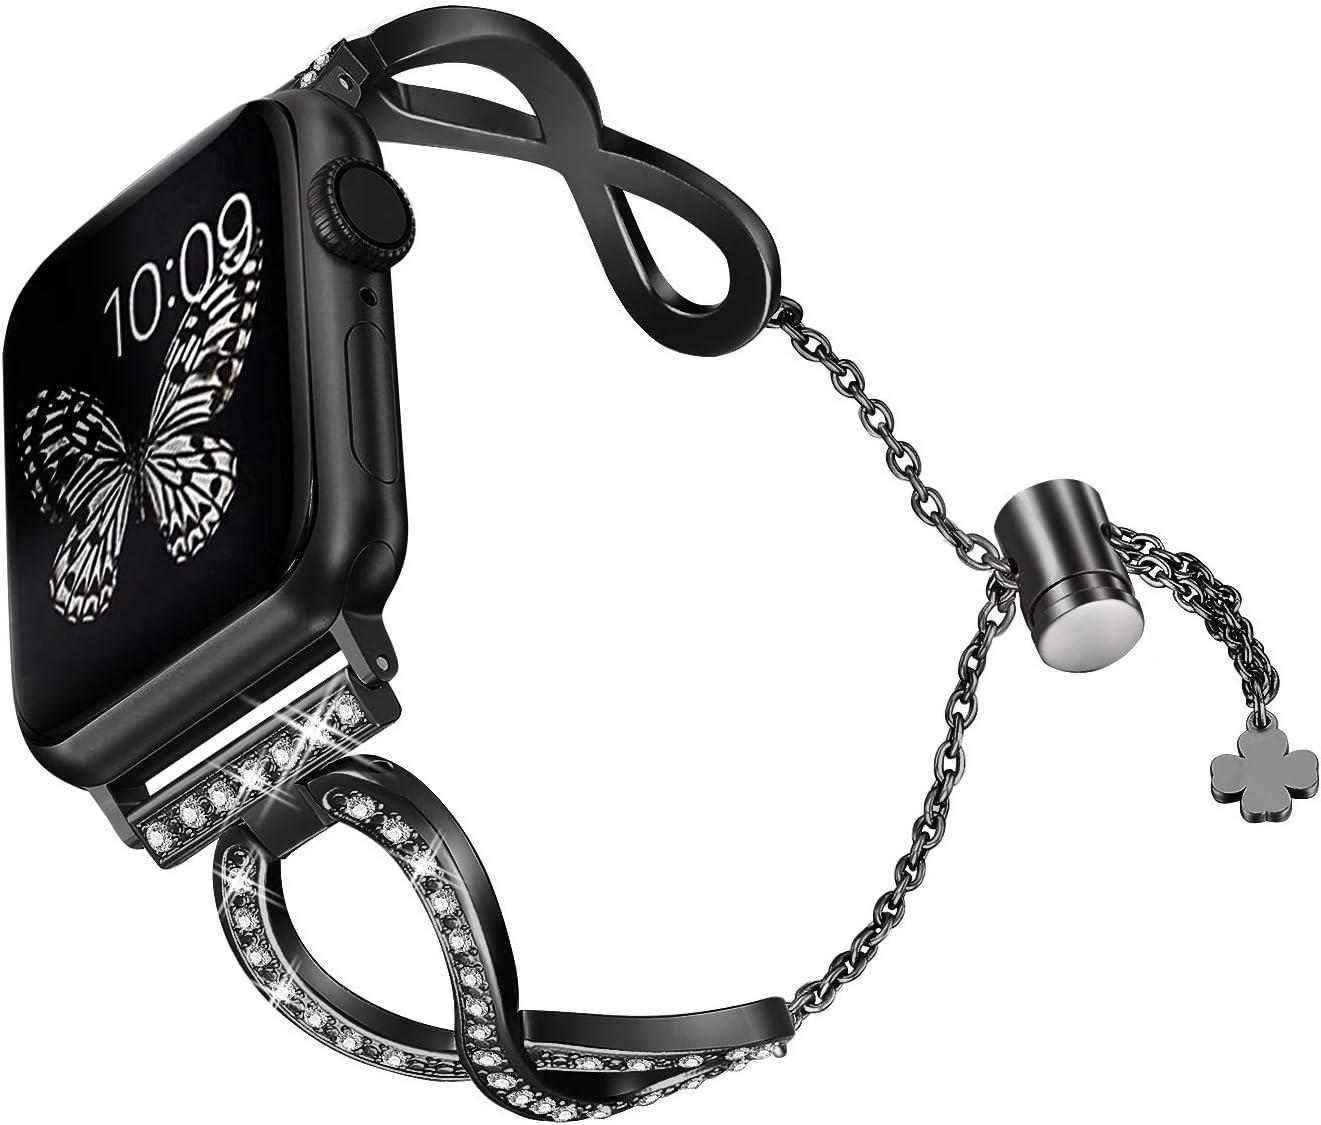 Malla Acero Para Apple Watch (38/40mm) Secbolt